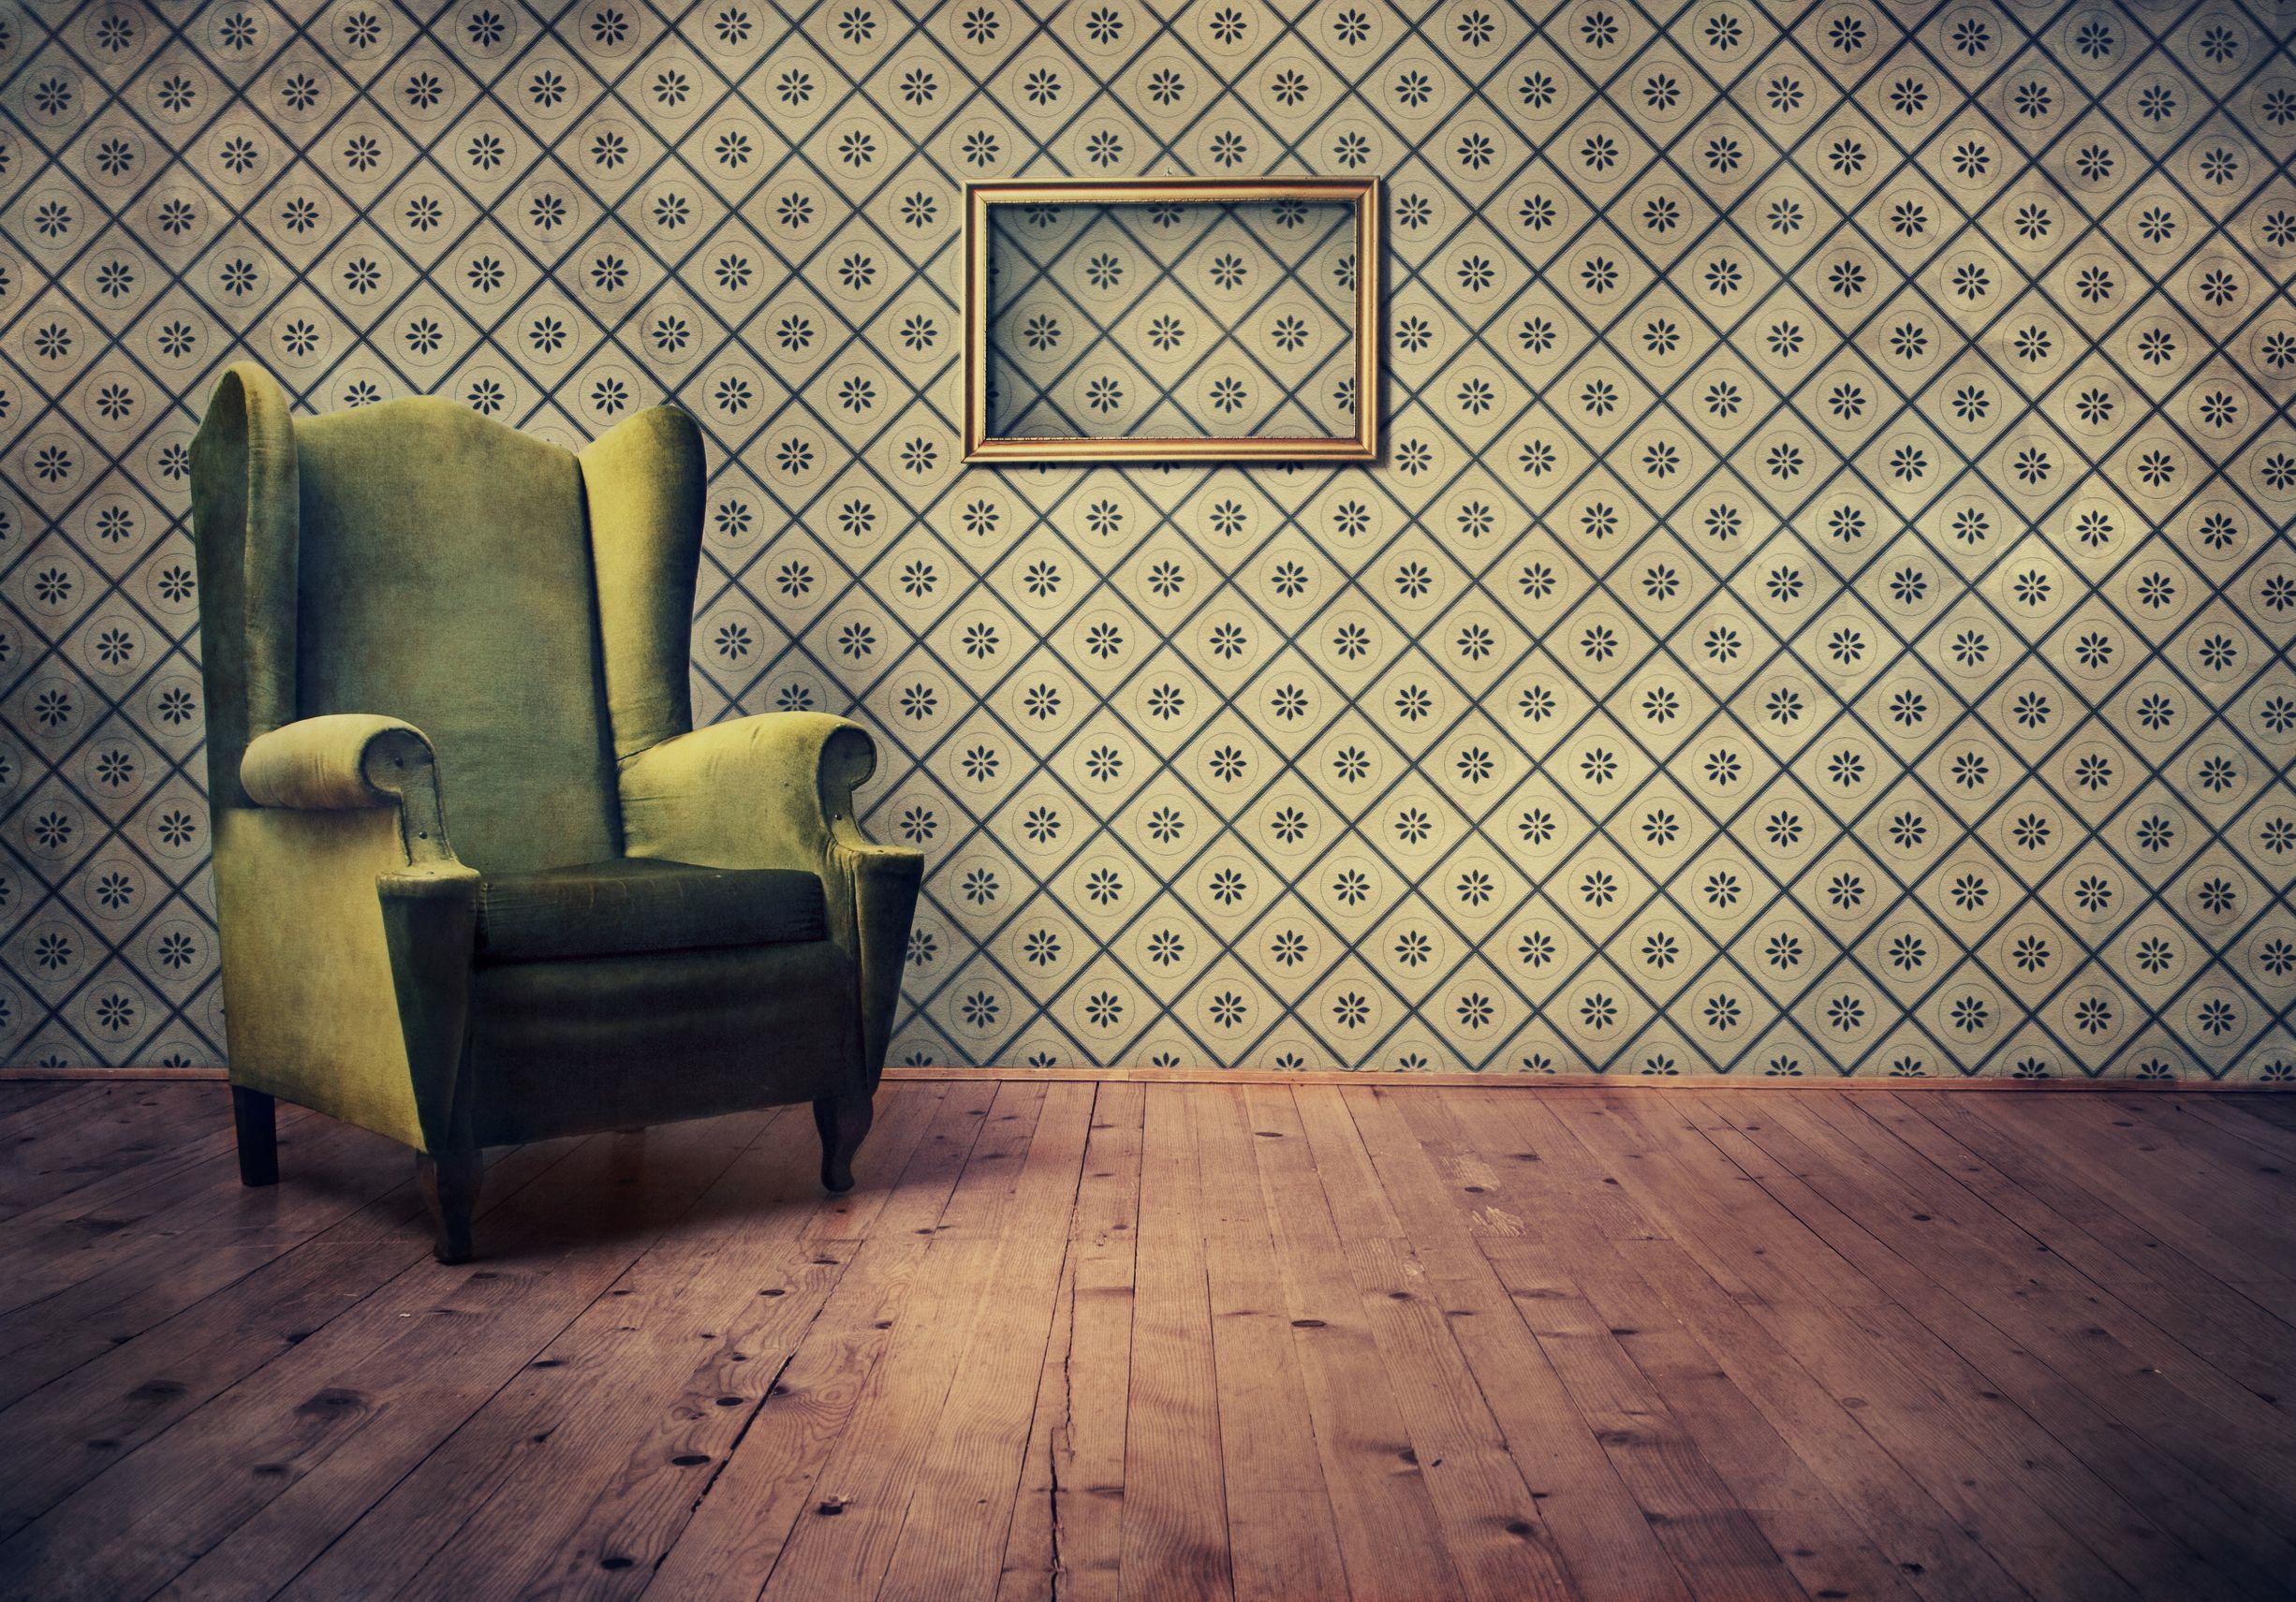 vintage room wallpaper photo - 2